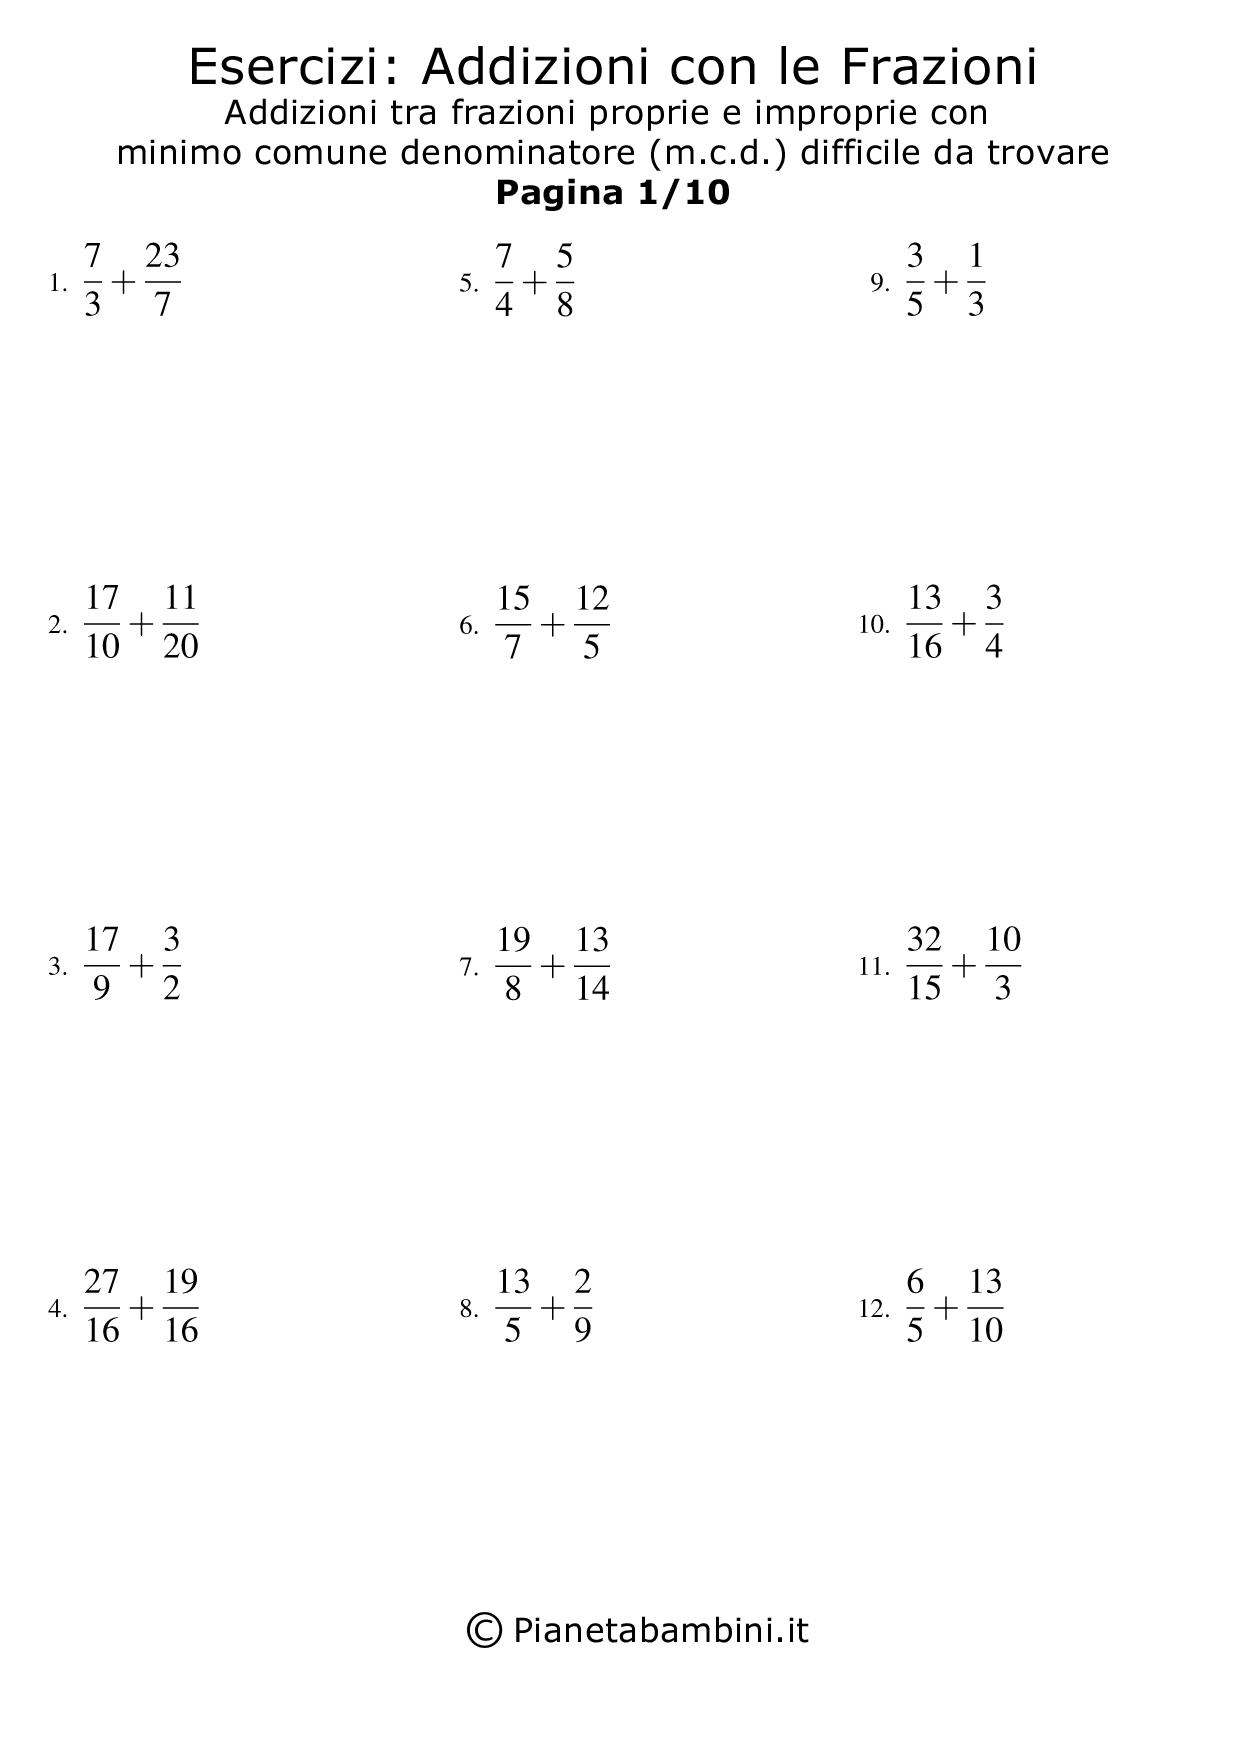 Frazioni-Proprie-Improprie-m.c.d-difficile_01